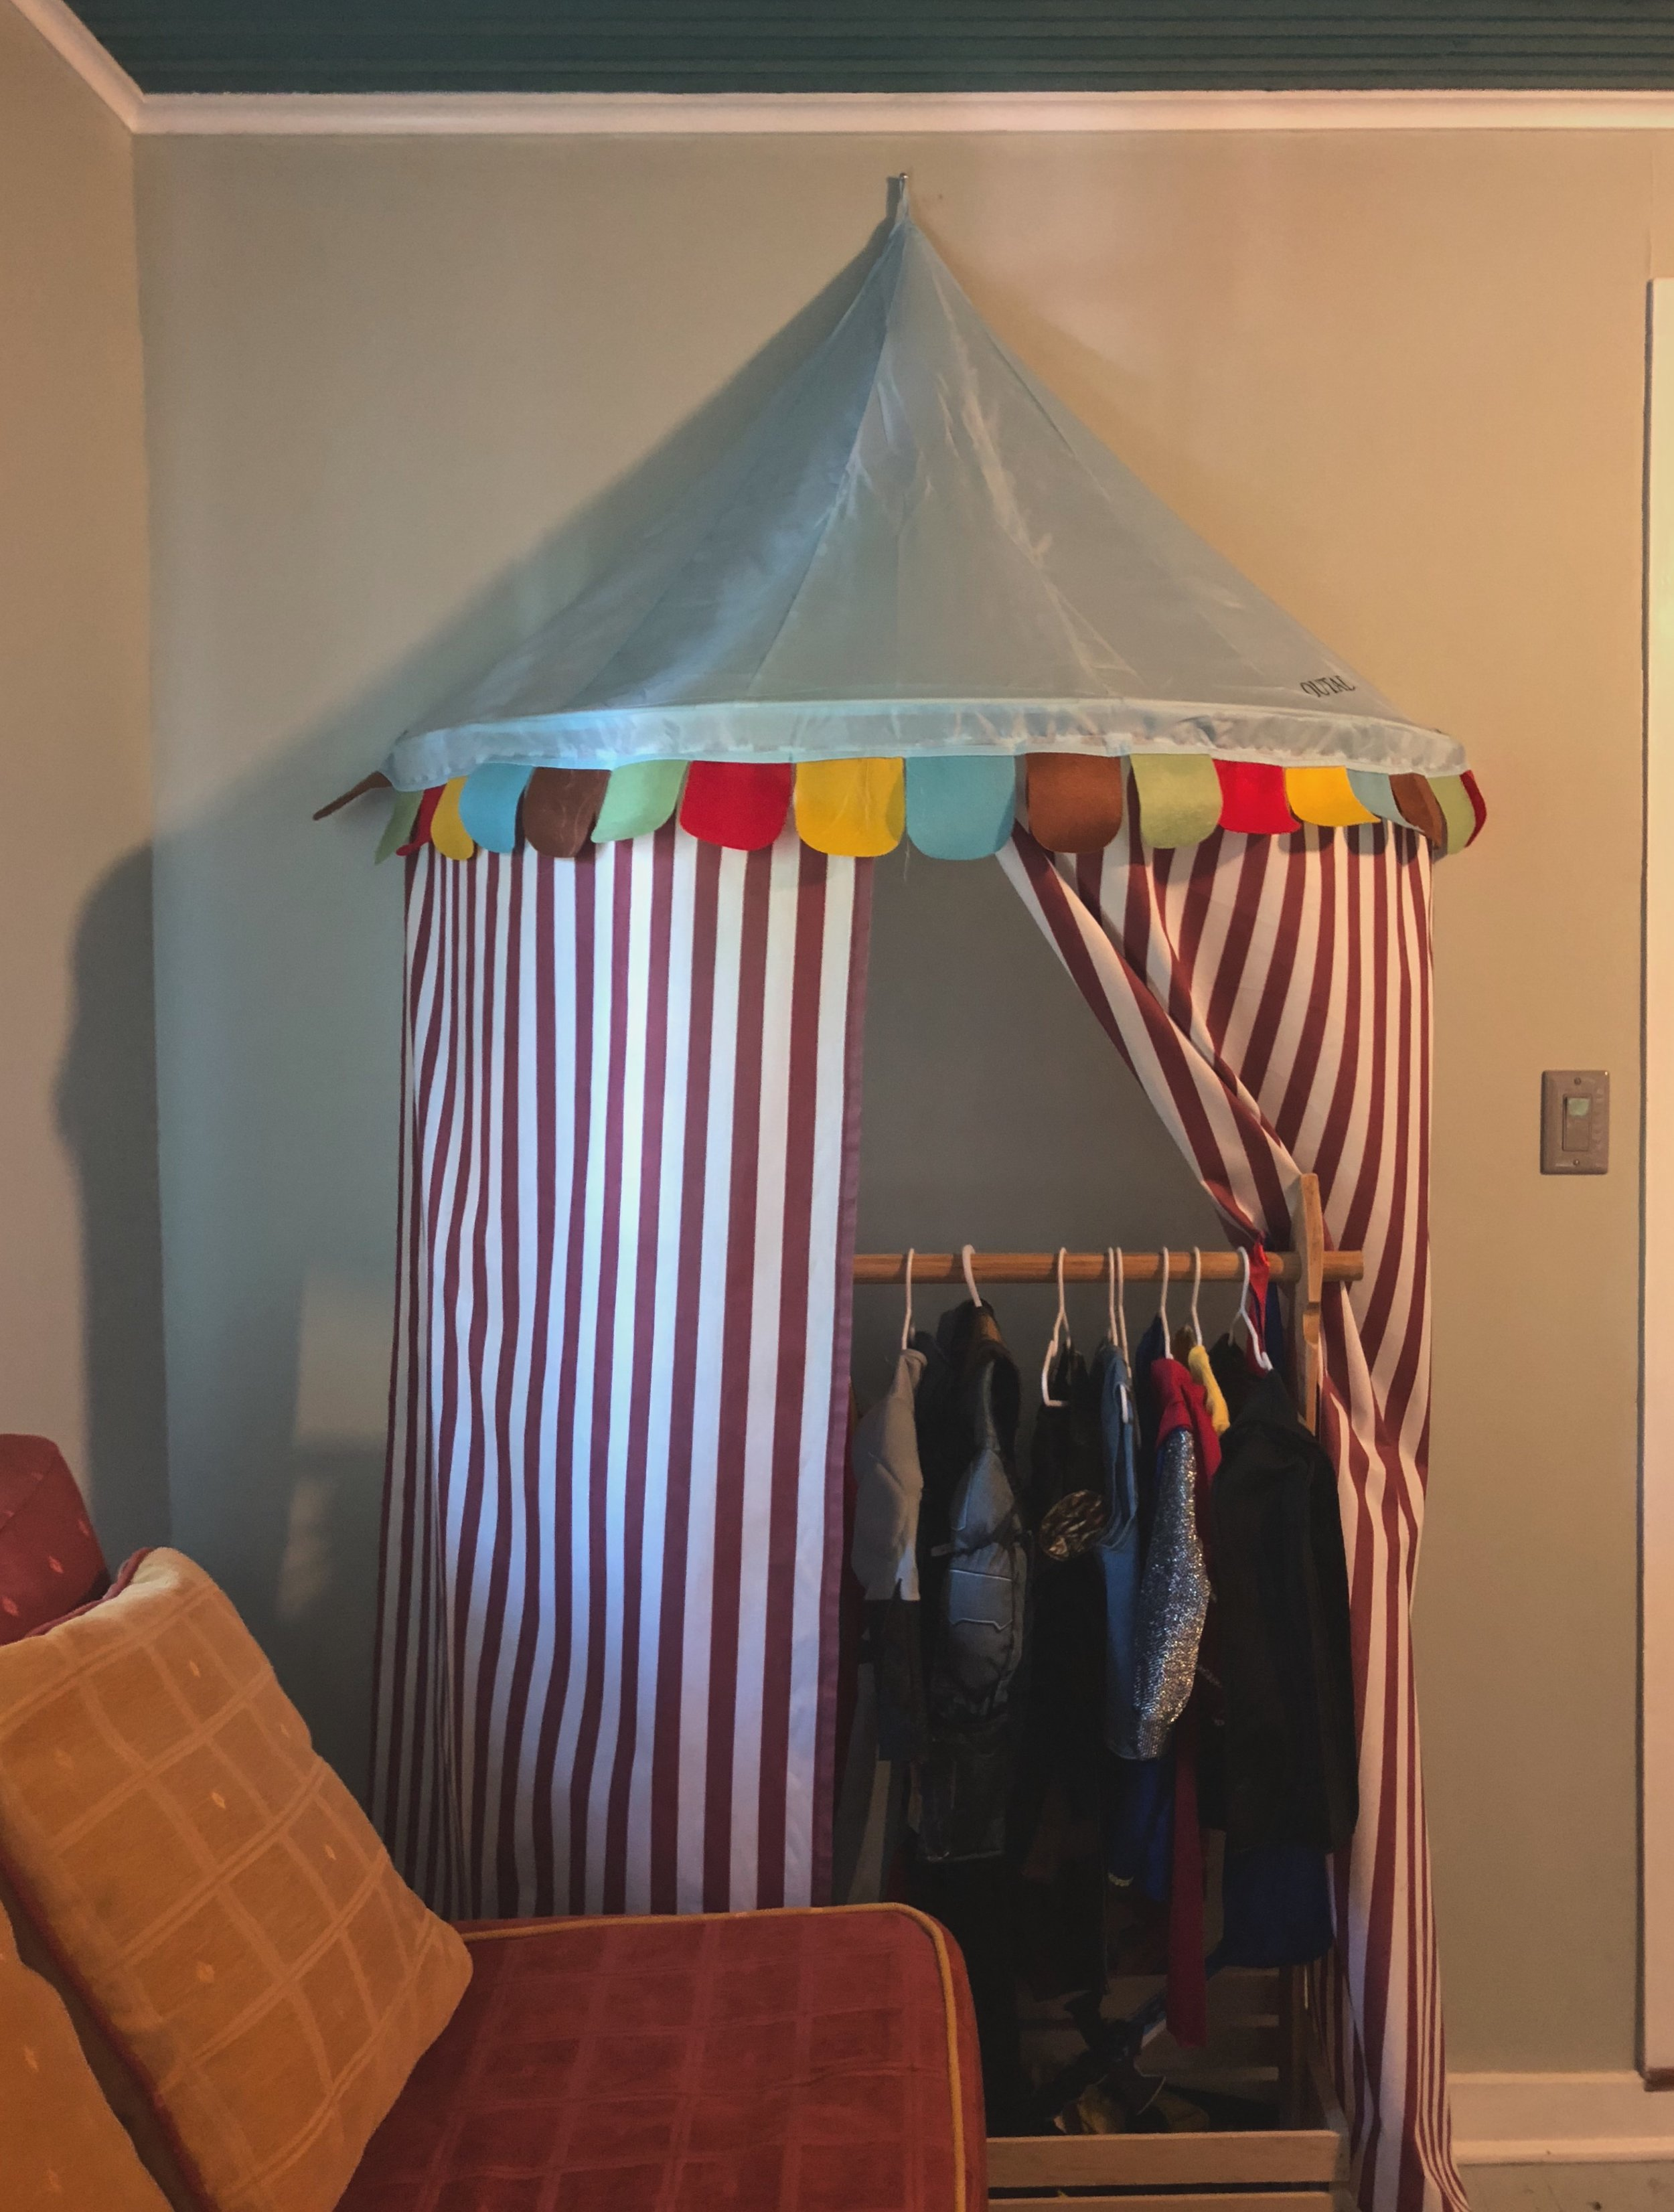 Costume cabana, or circus tent!